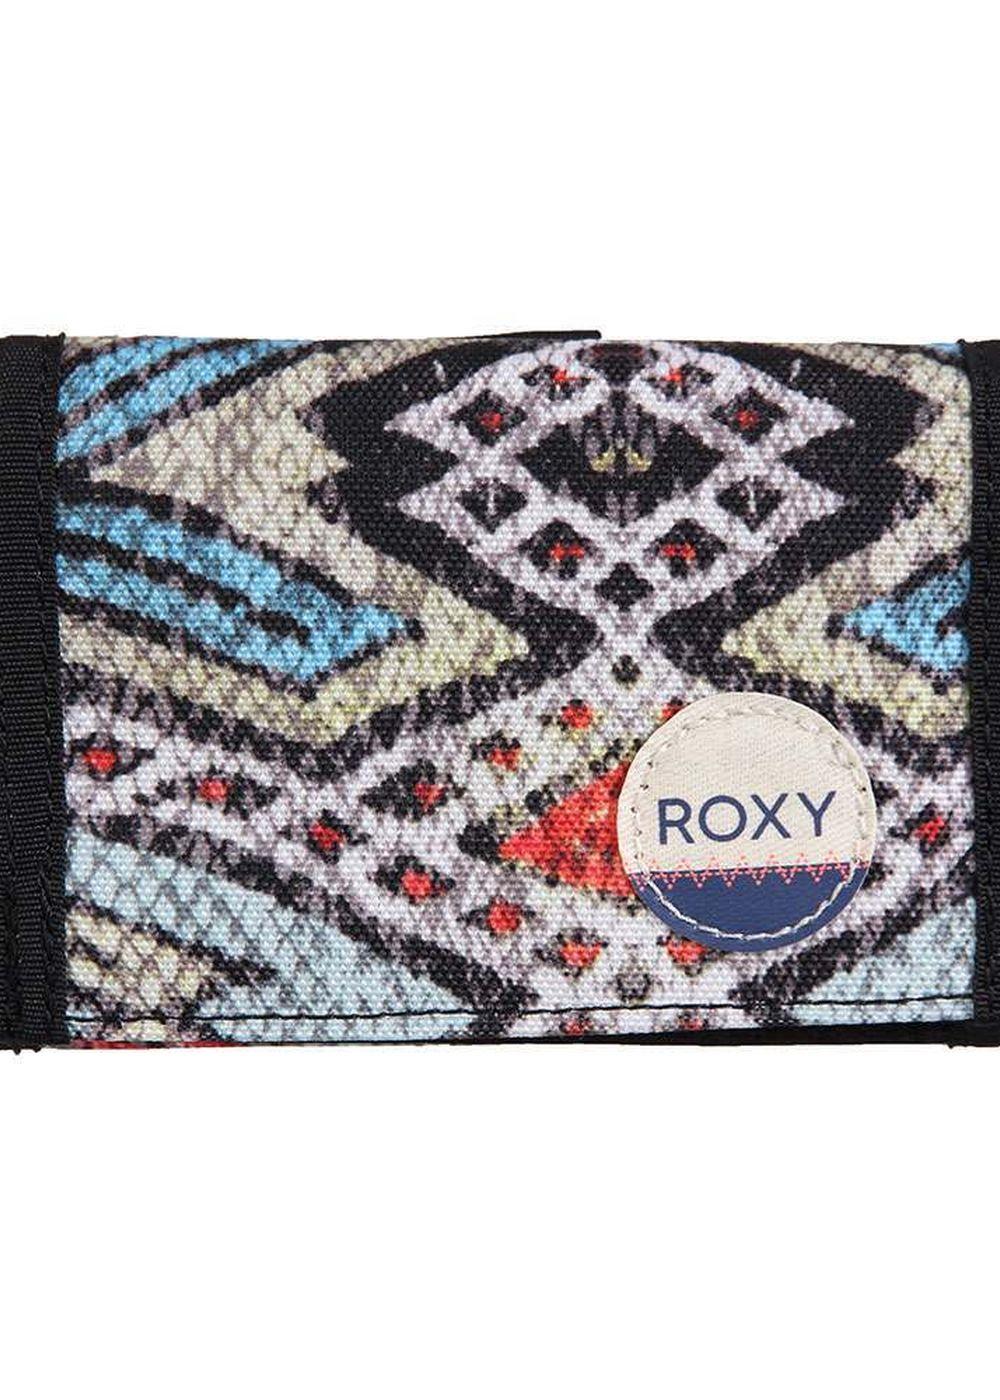 roxy small beach wallet regata soaring eyes